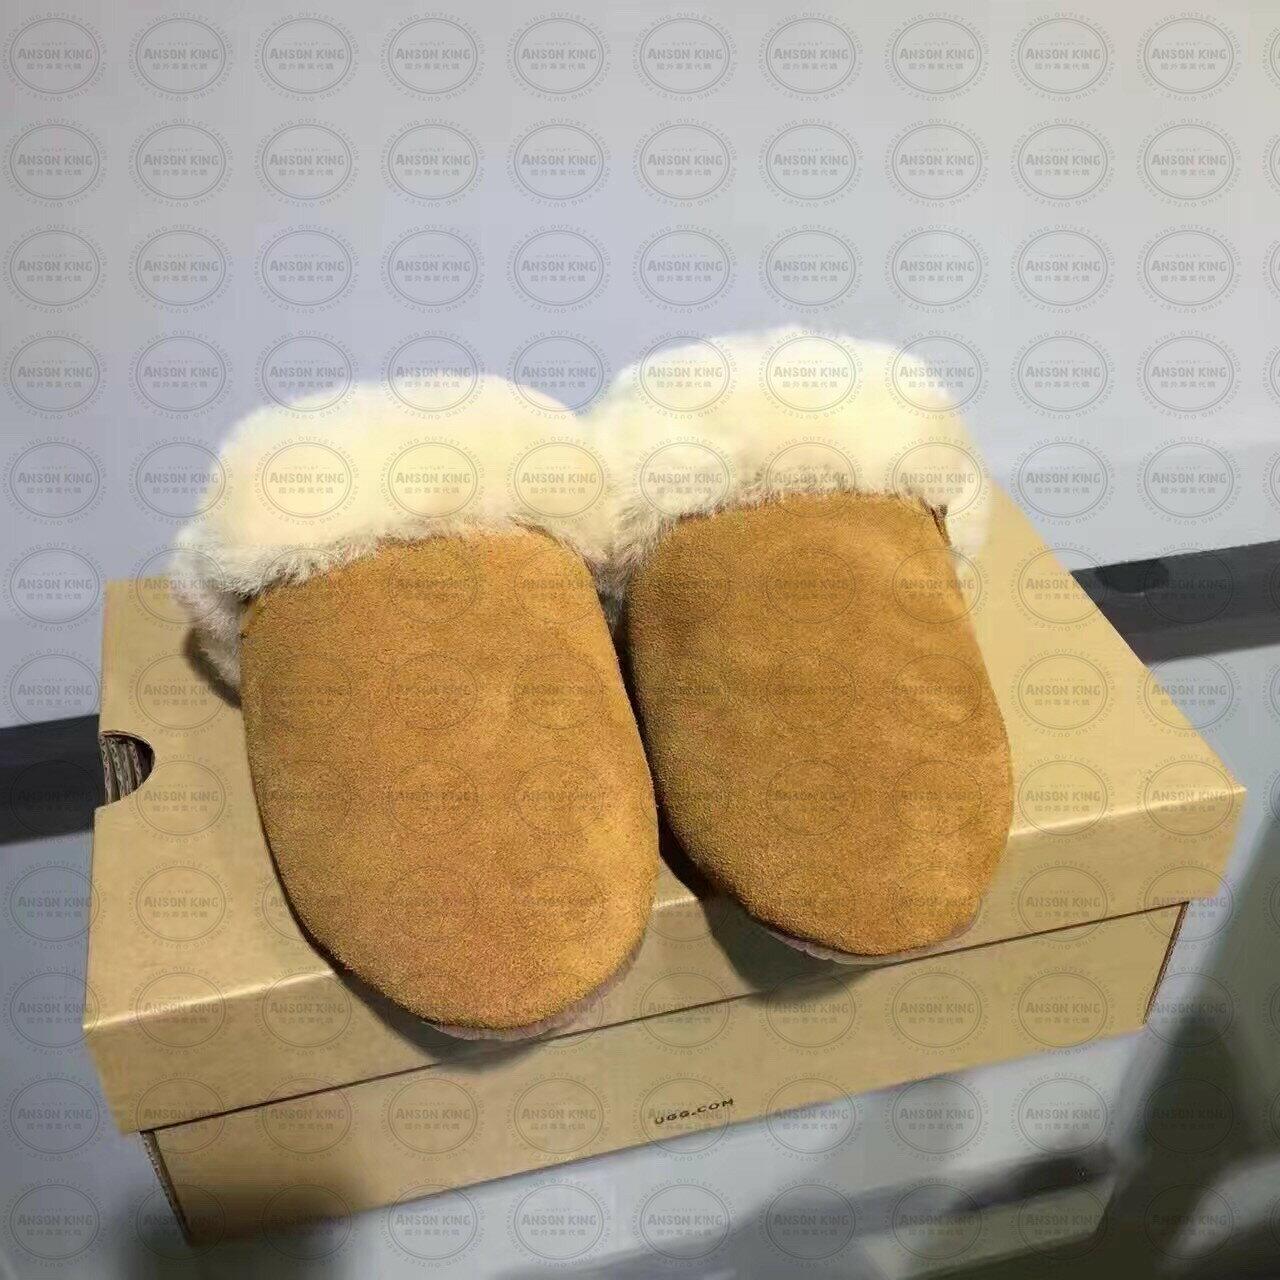 OUTLET代購 UGG 毛毛居家拖鞋 懶人鞋 真皮羊皮毛 雪靴 長靴 短靴 駝色 1